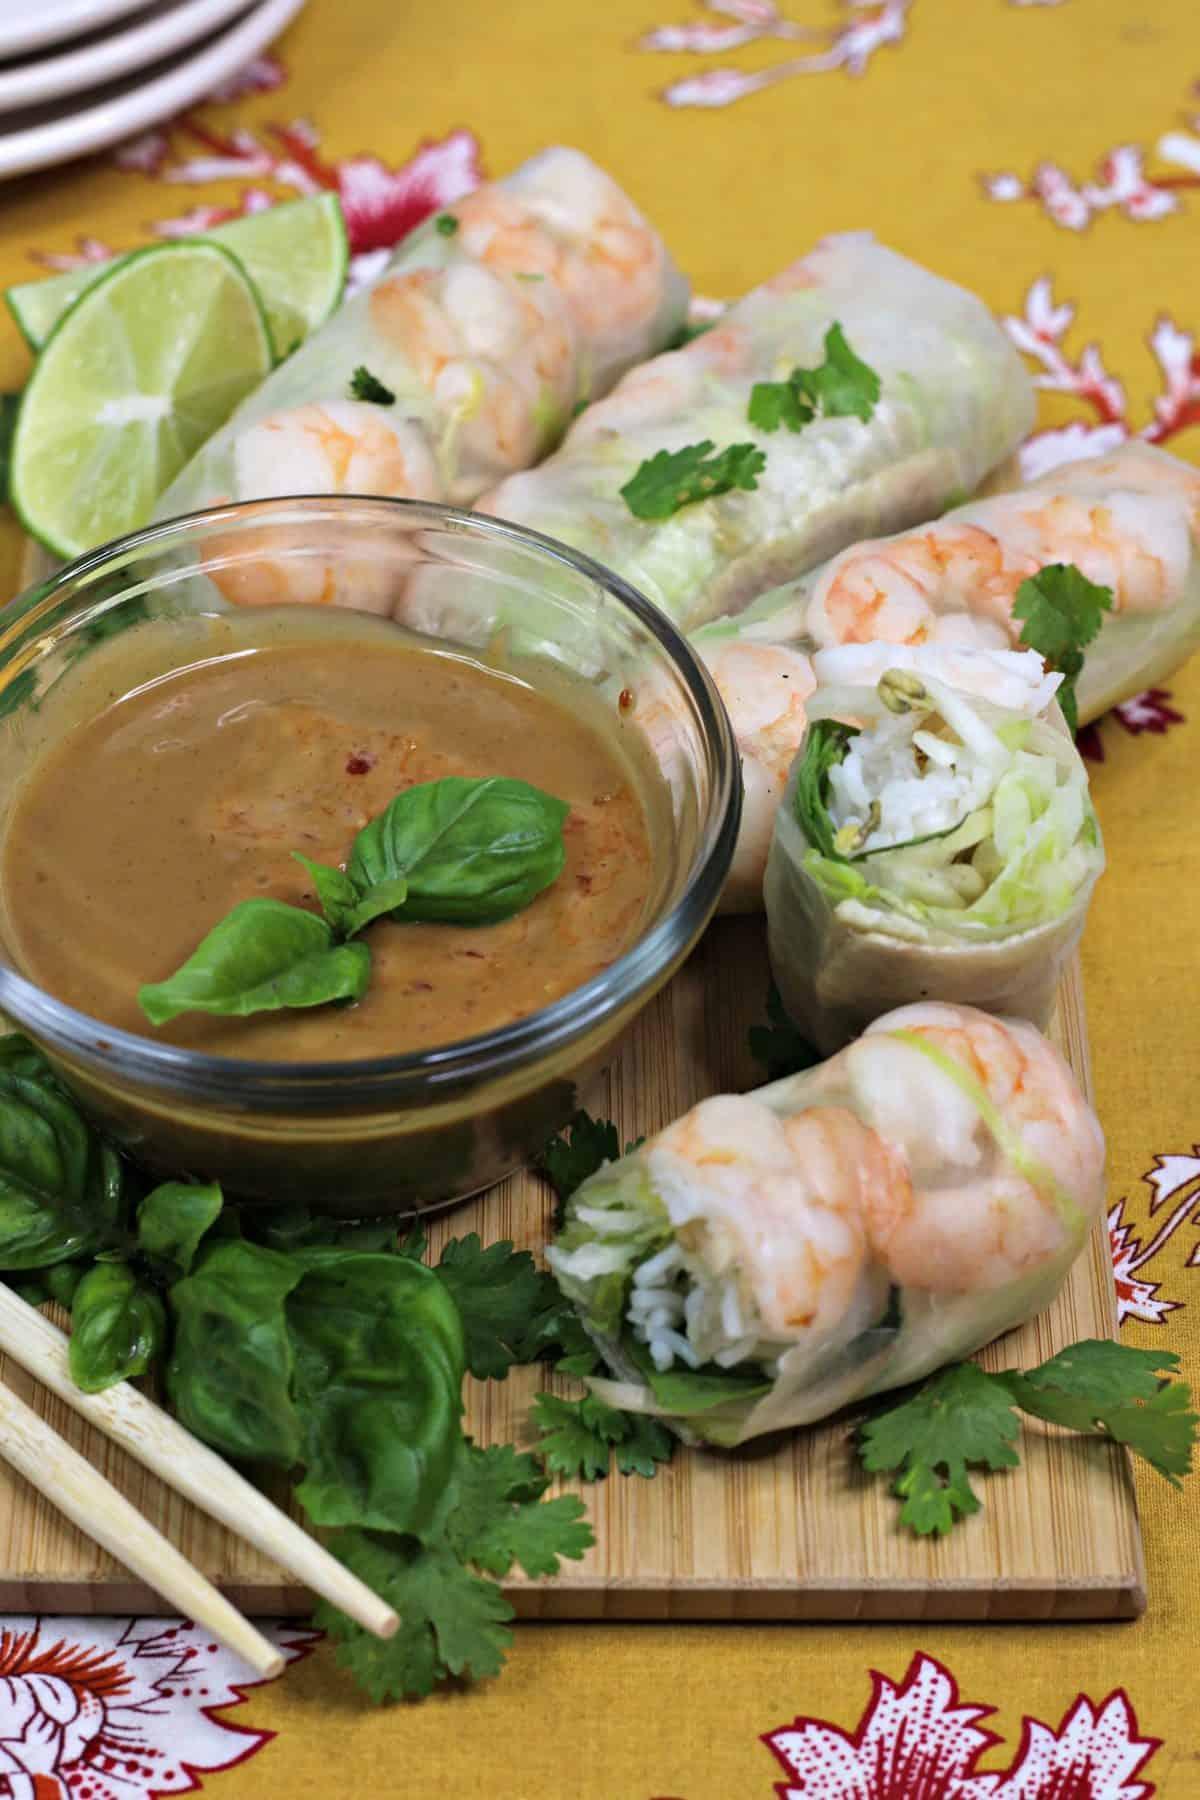 Homemade Thai Spring Rolls, Thai Spring Rolls With Homemade Peanut Sauce, Thai shrimp rolls